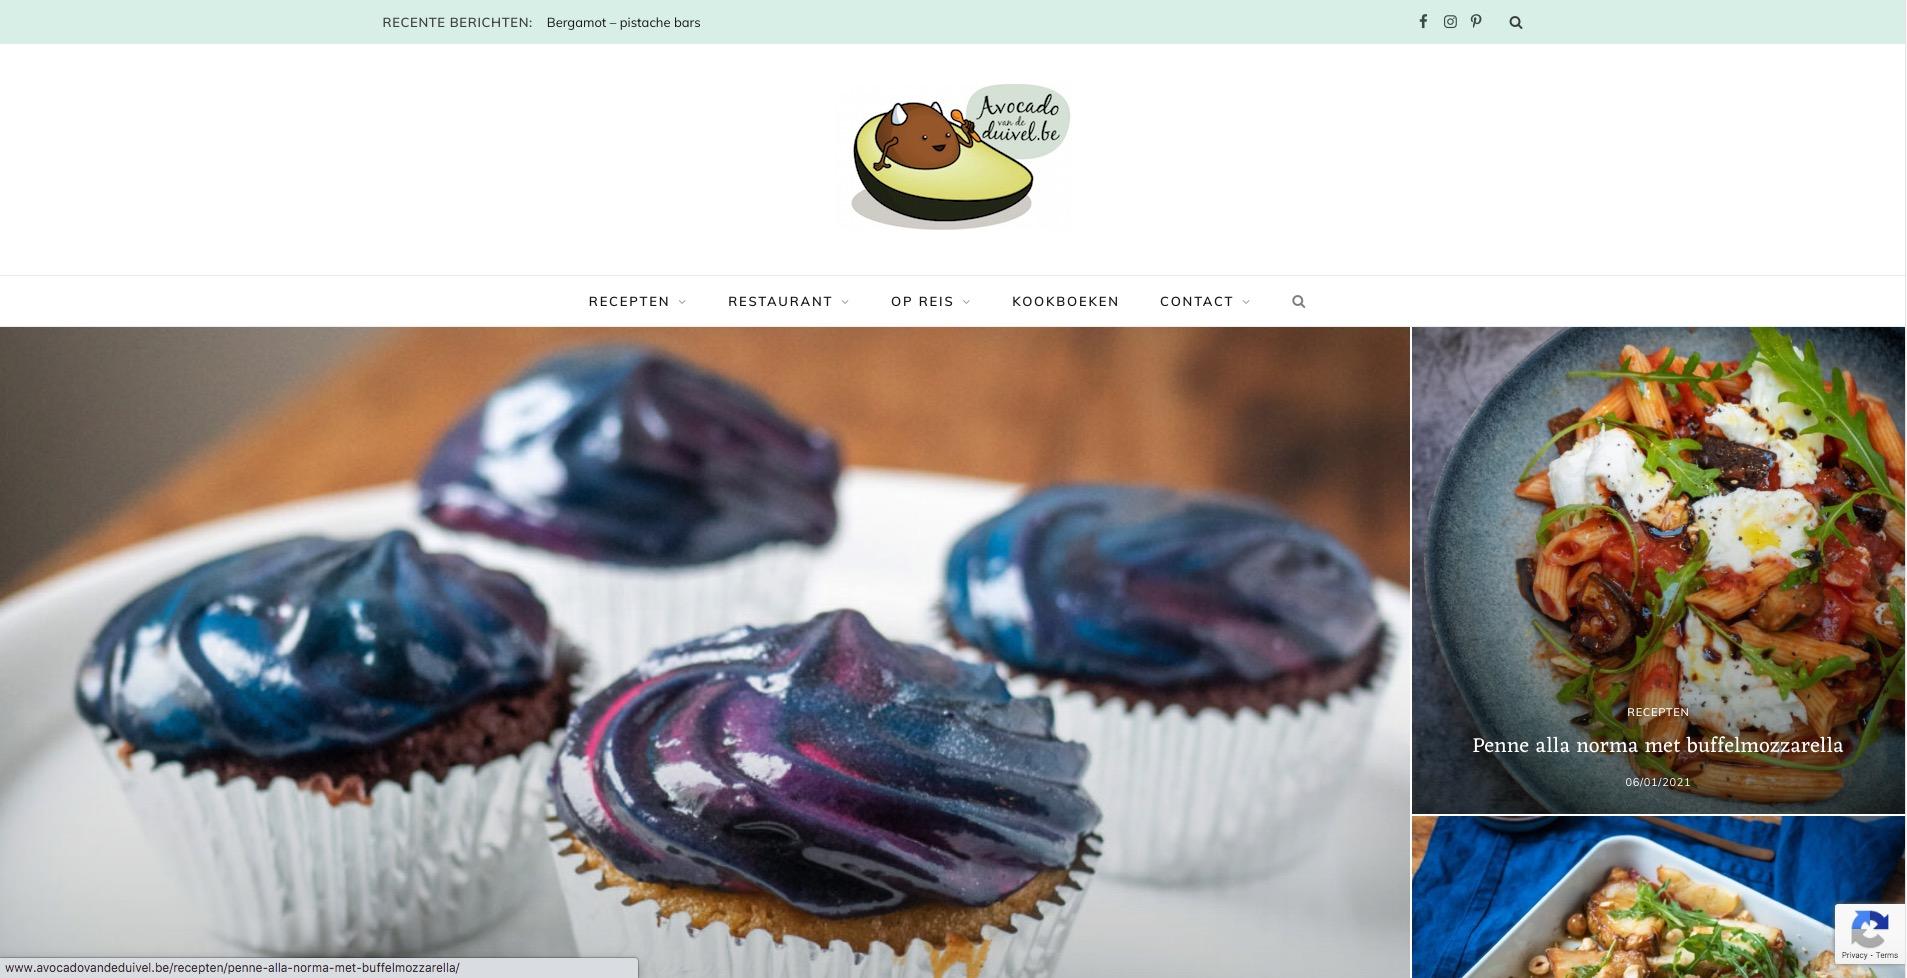 Avocado van de Duivel Homepage